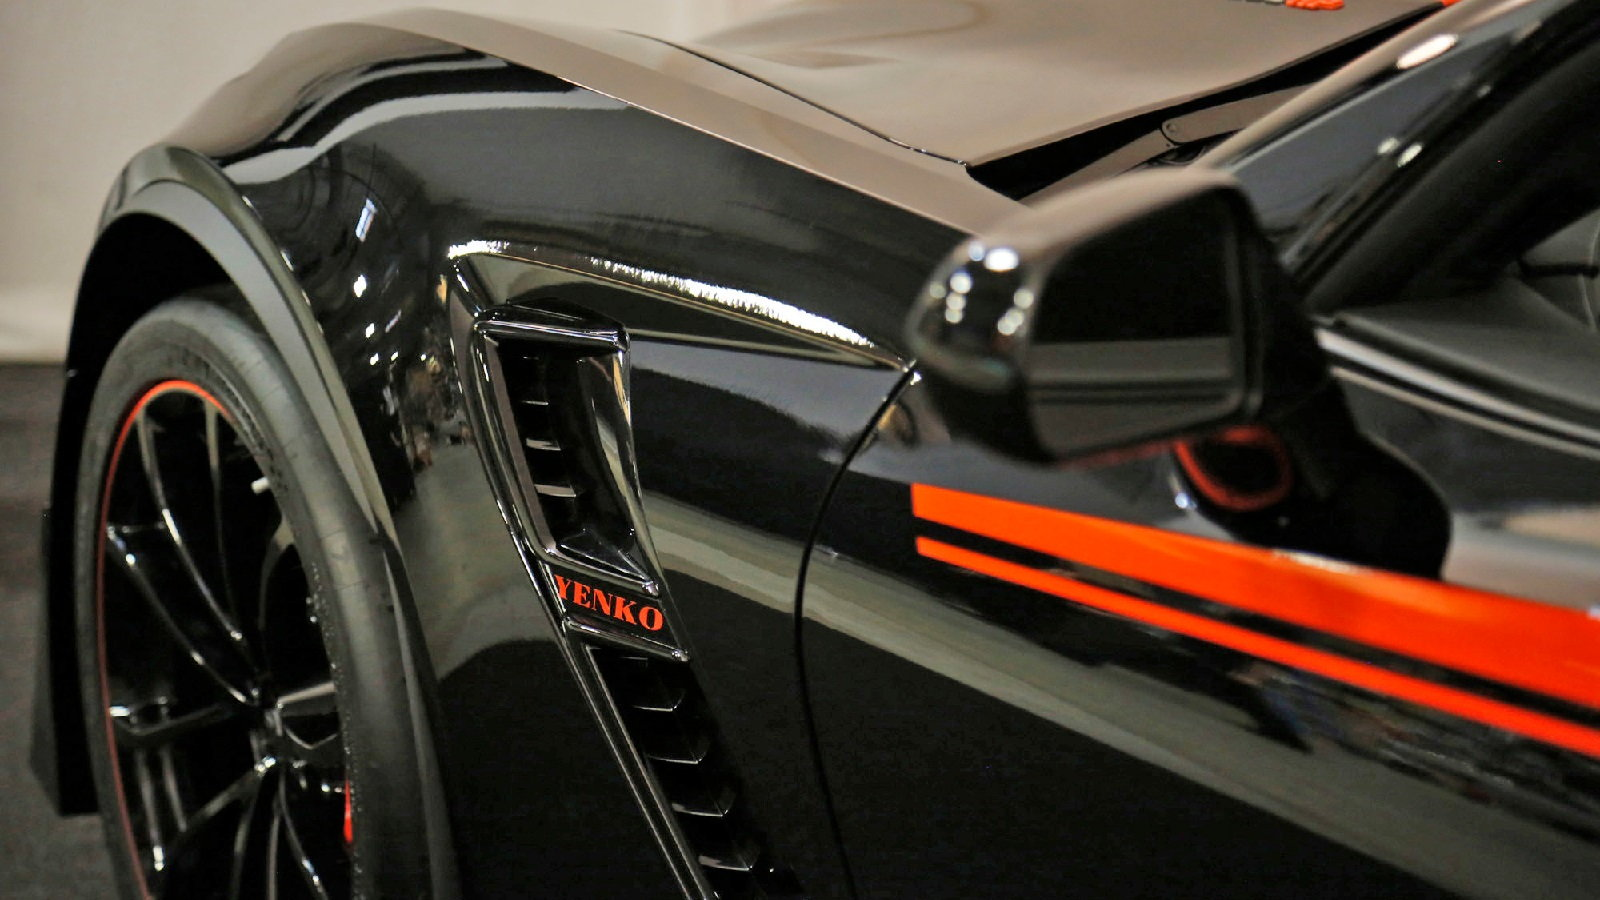 Yenko C7 Corvette Turns It Up With 1,000HP